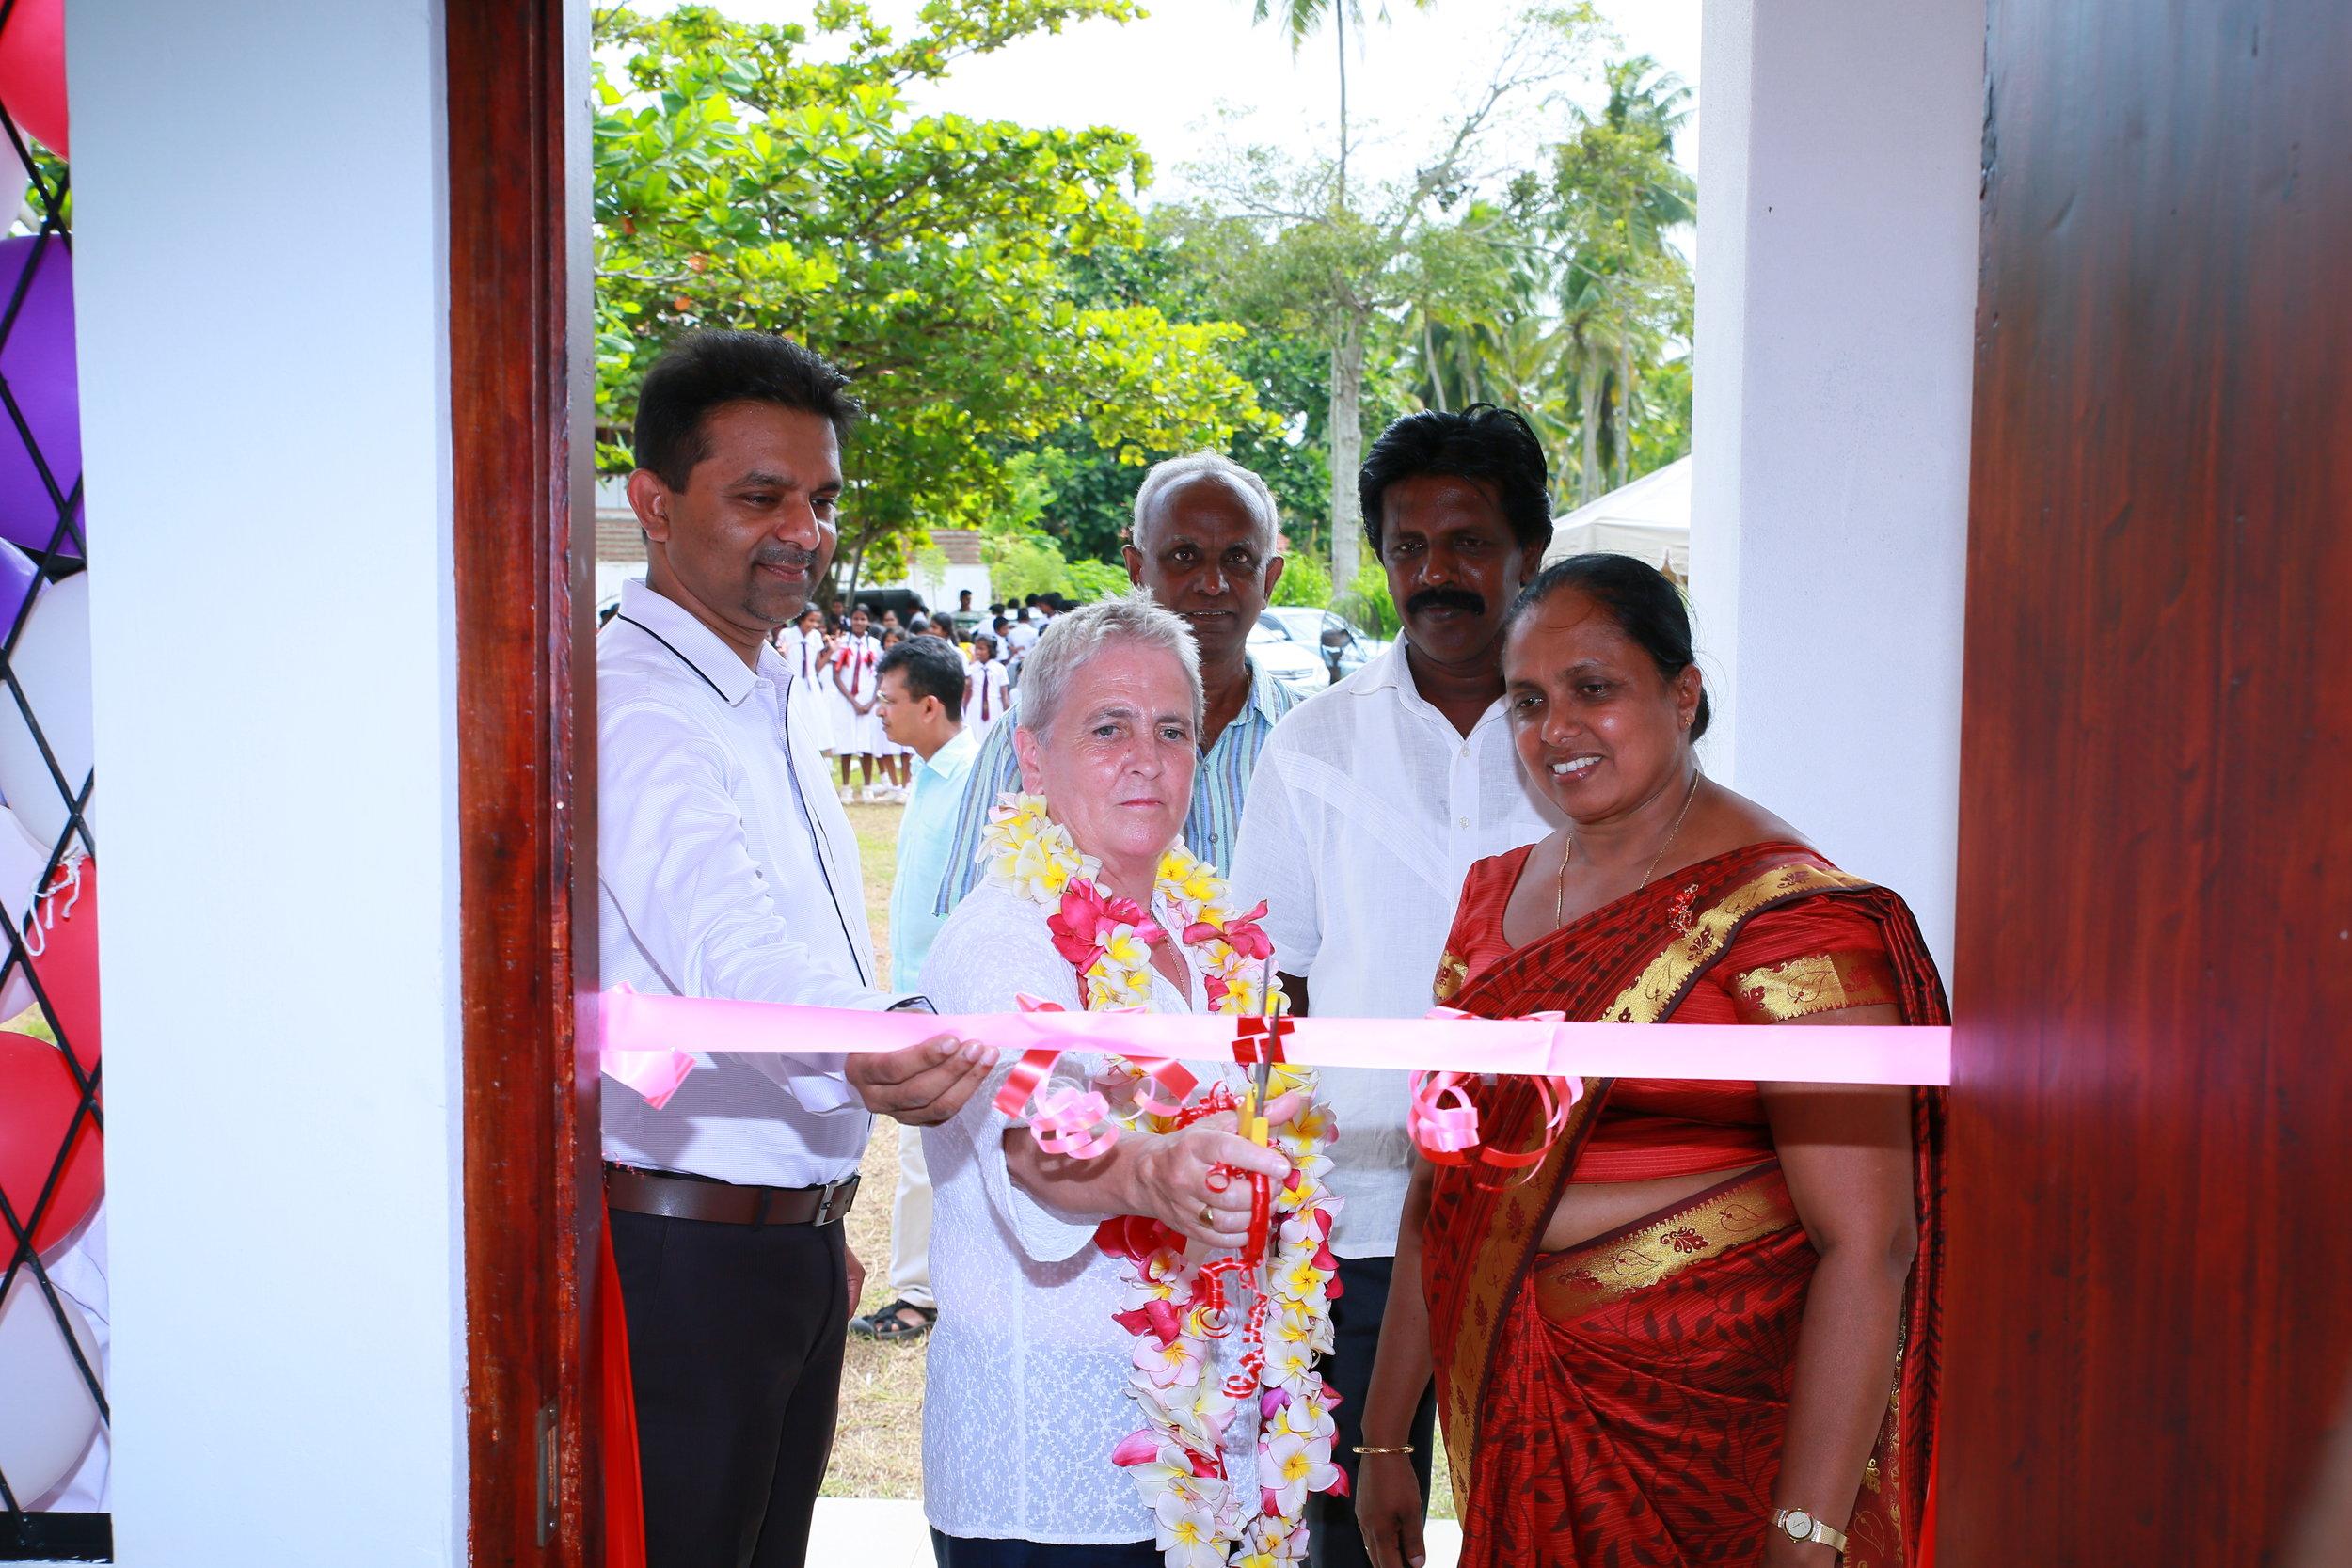 Chris McGrail opening the new building in Moragalla Junior School, Sri Lanka.